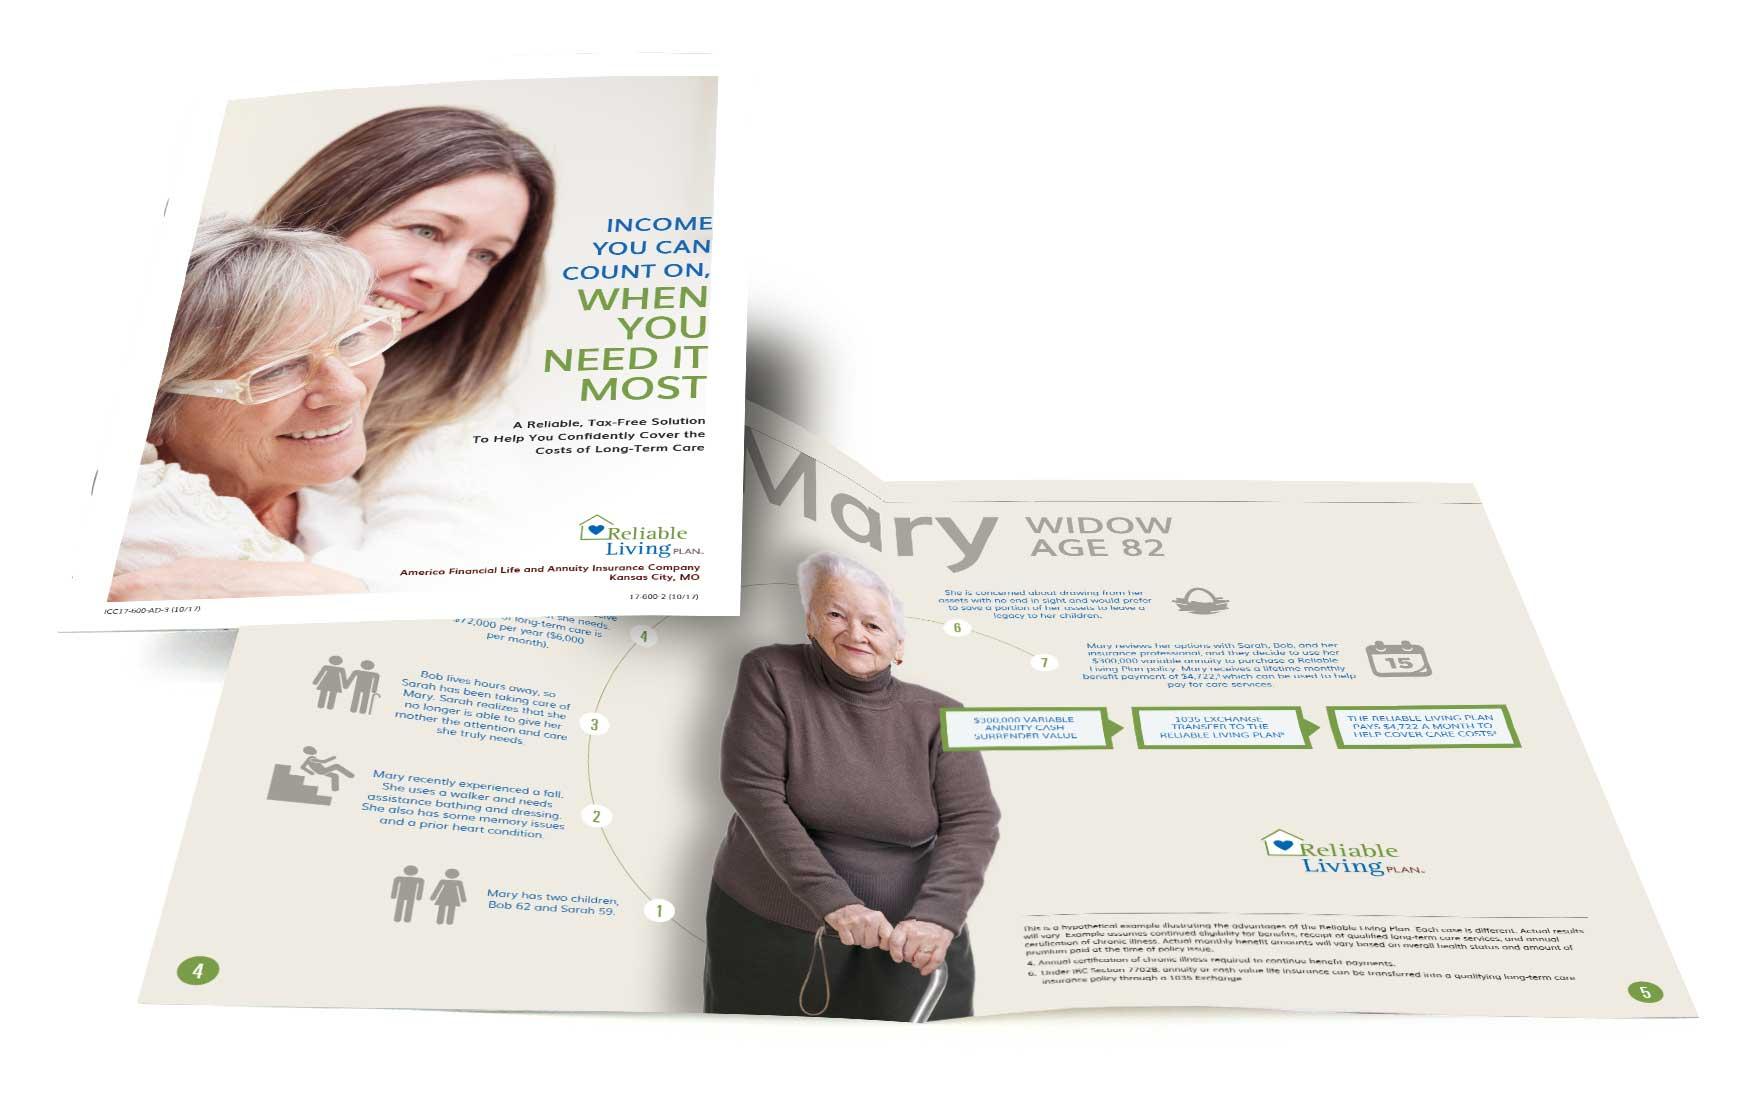 Reliable Living Plan Brochure